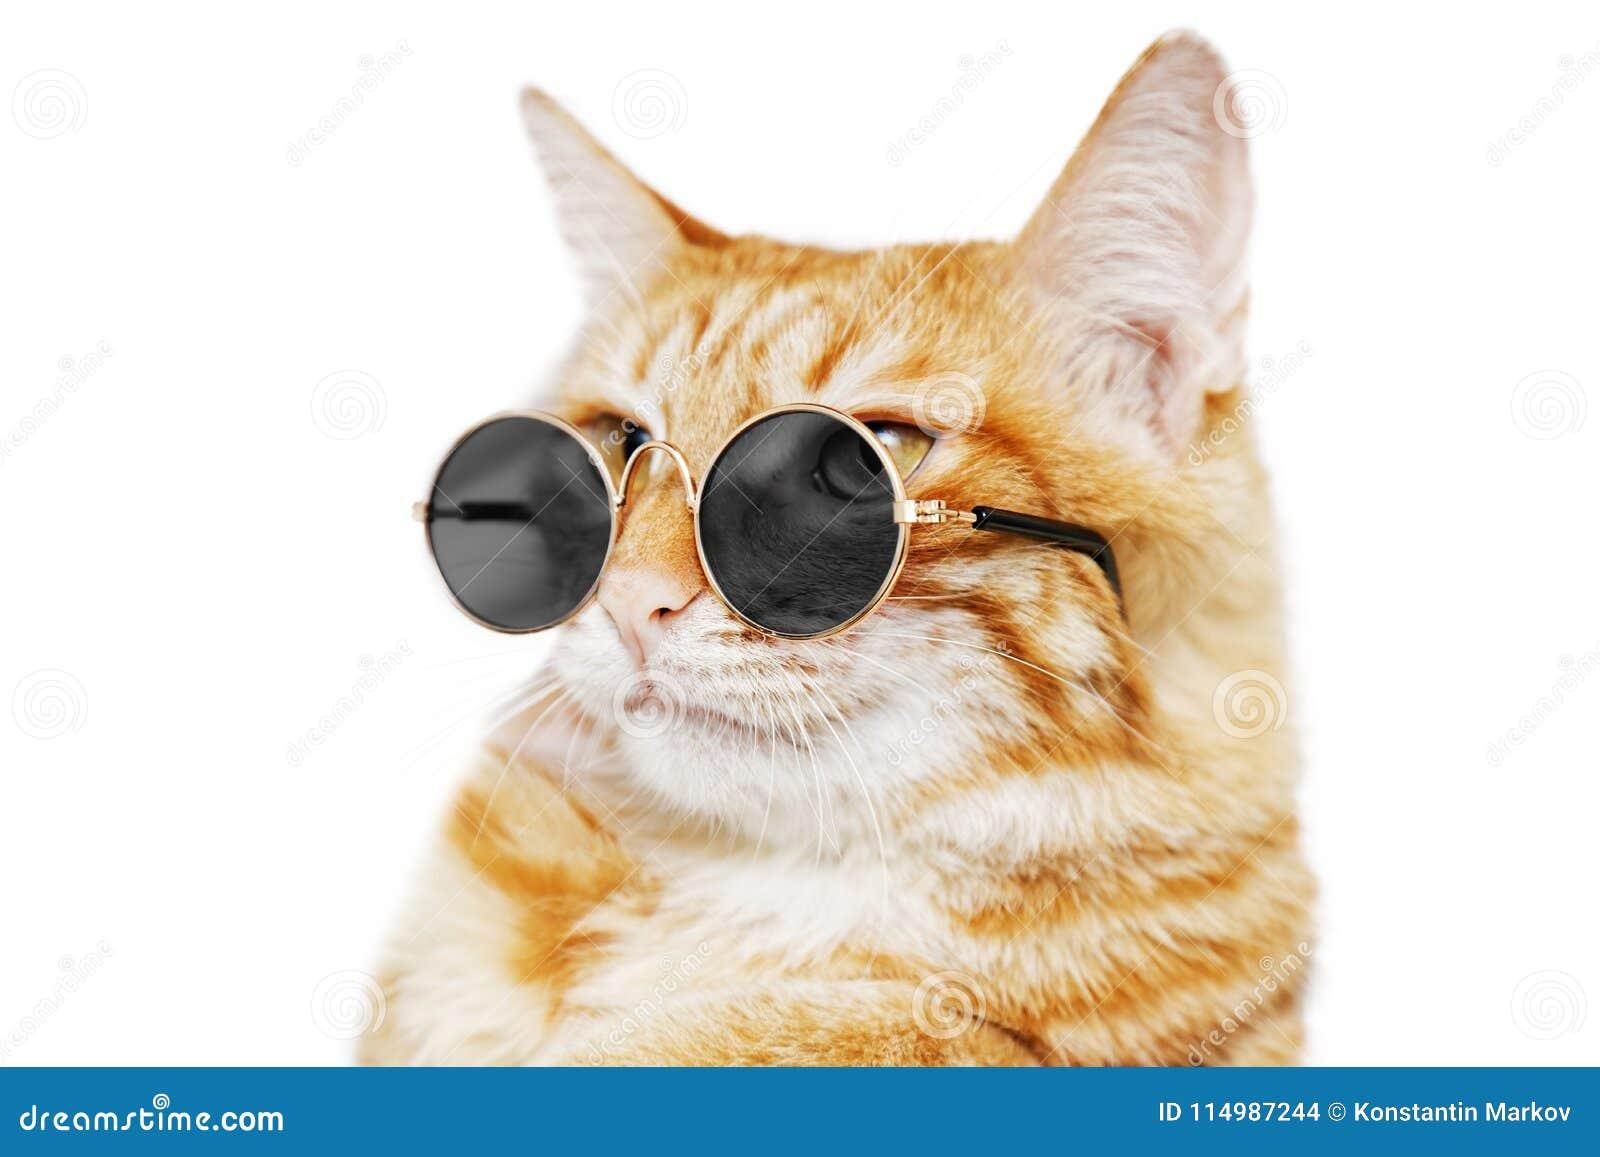 Closeup portrait of funny ginger cat wearing sunglasses